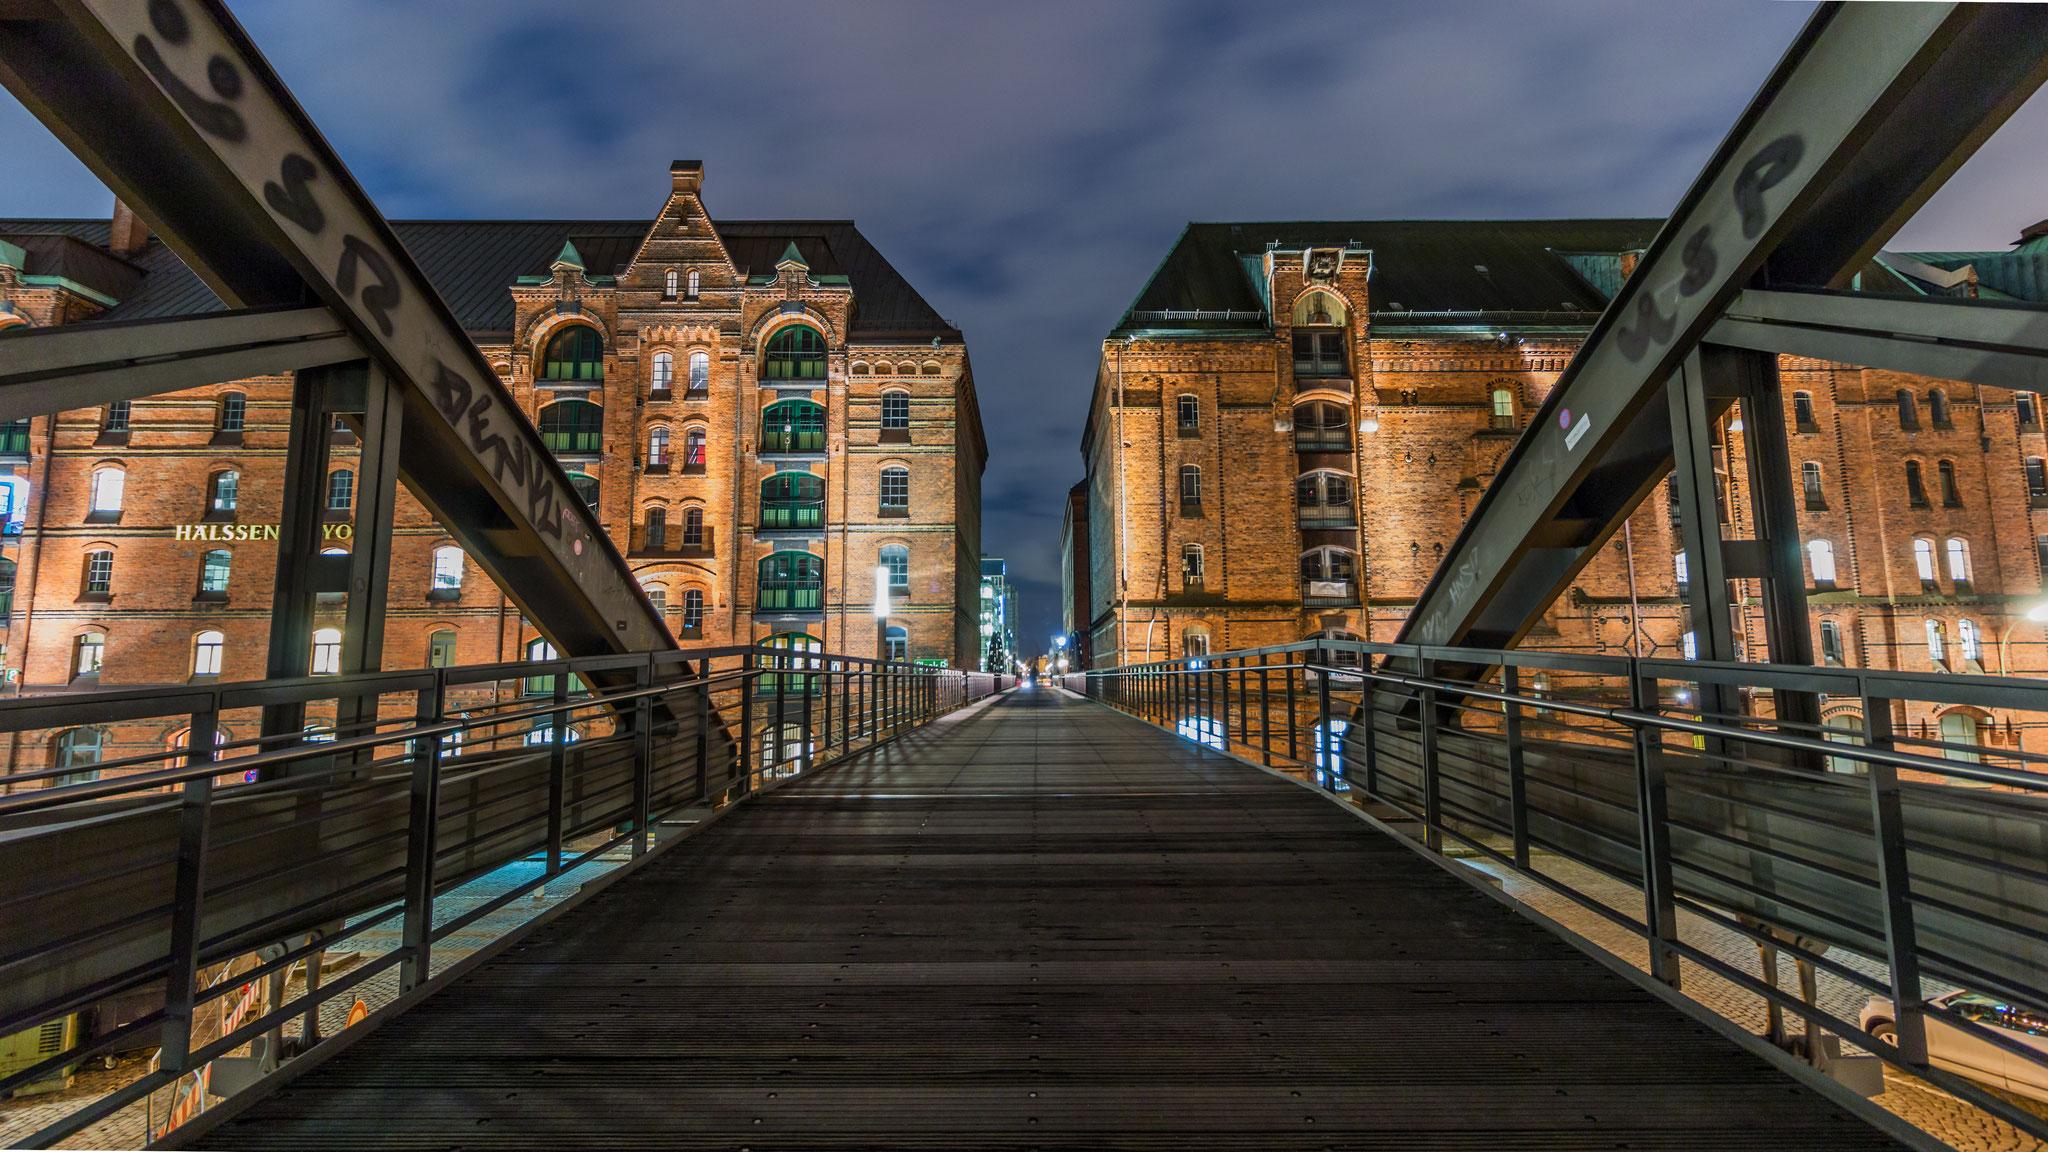 Einschiffung: Hamburg